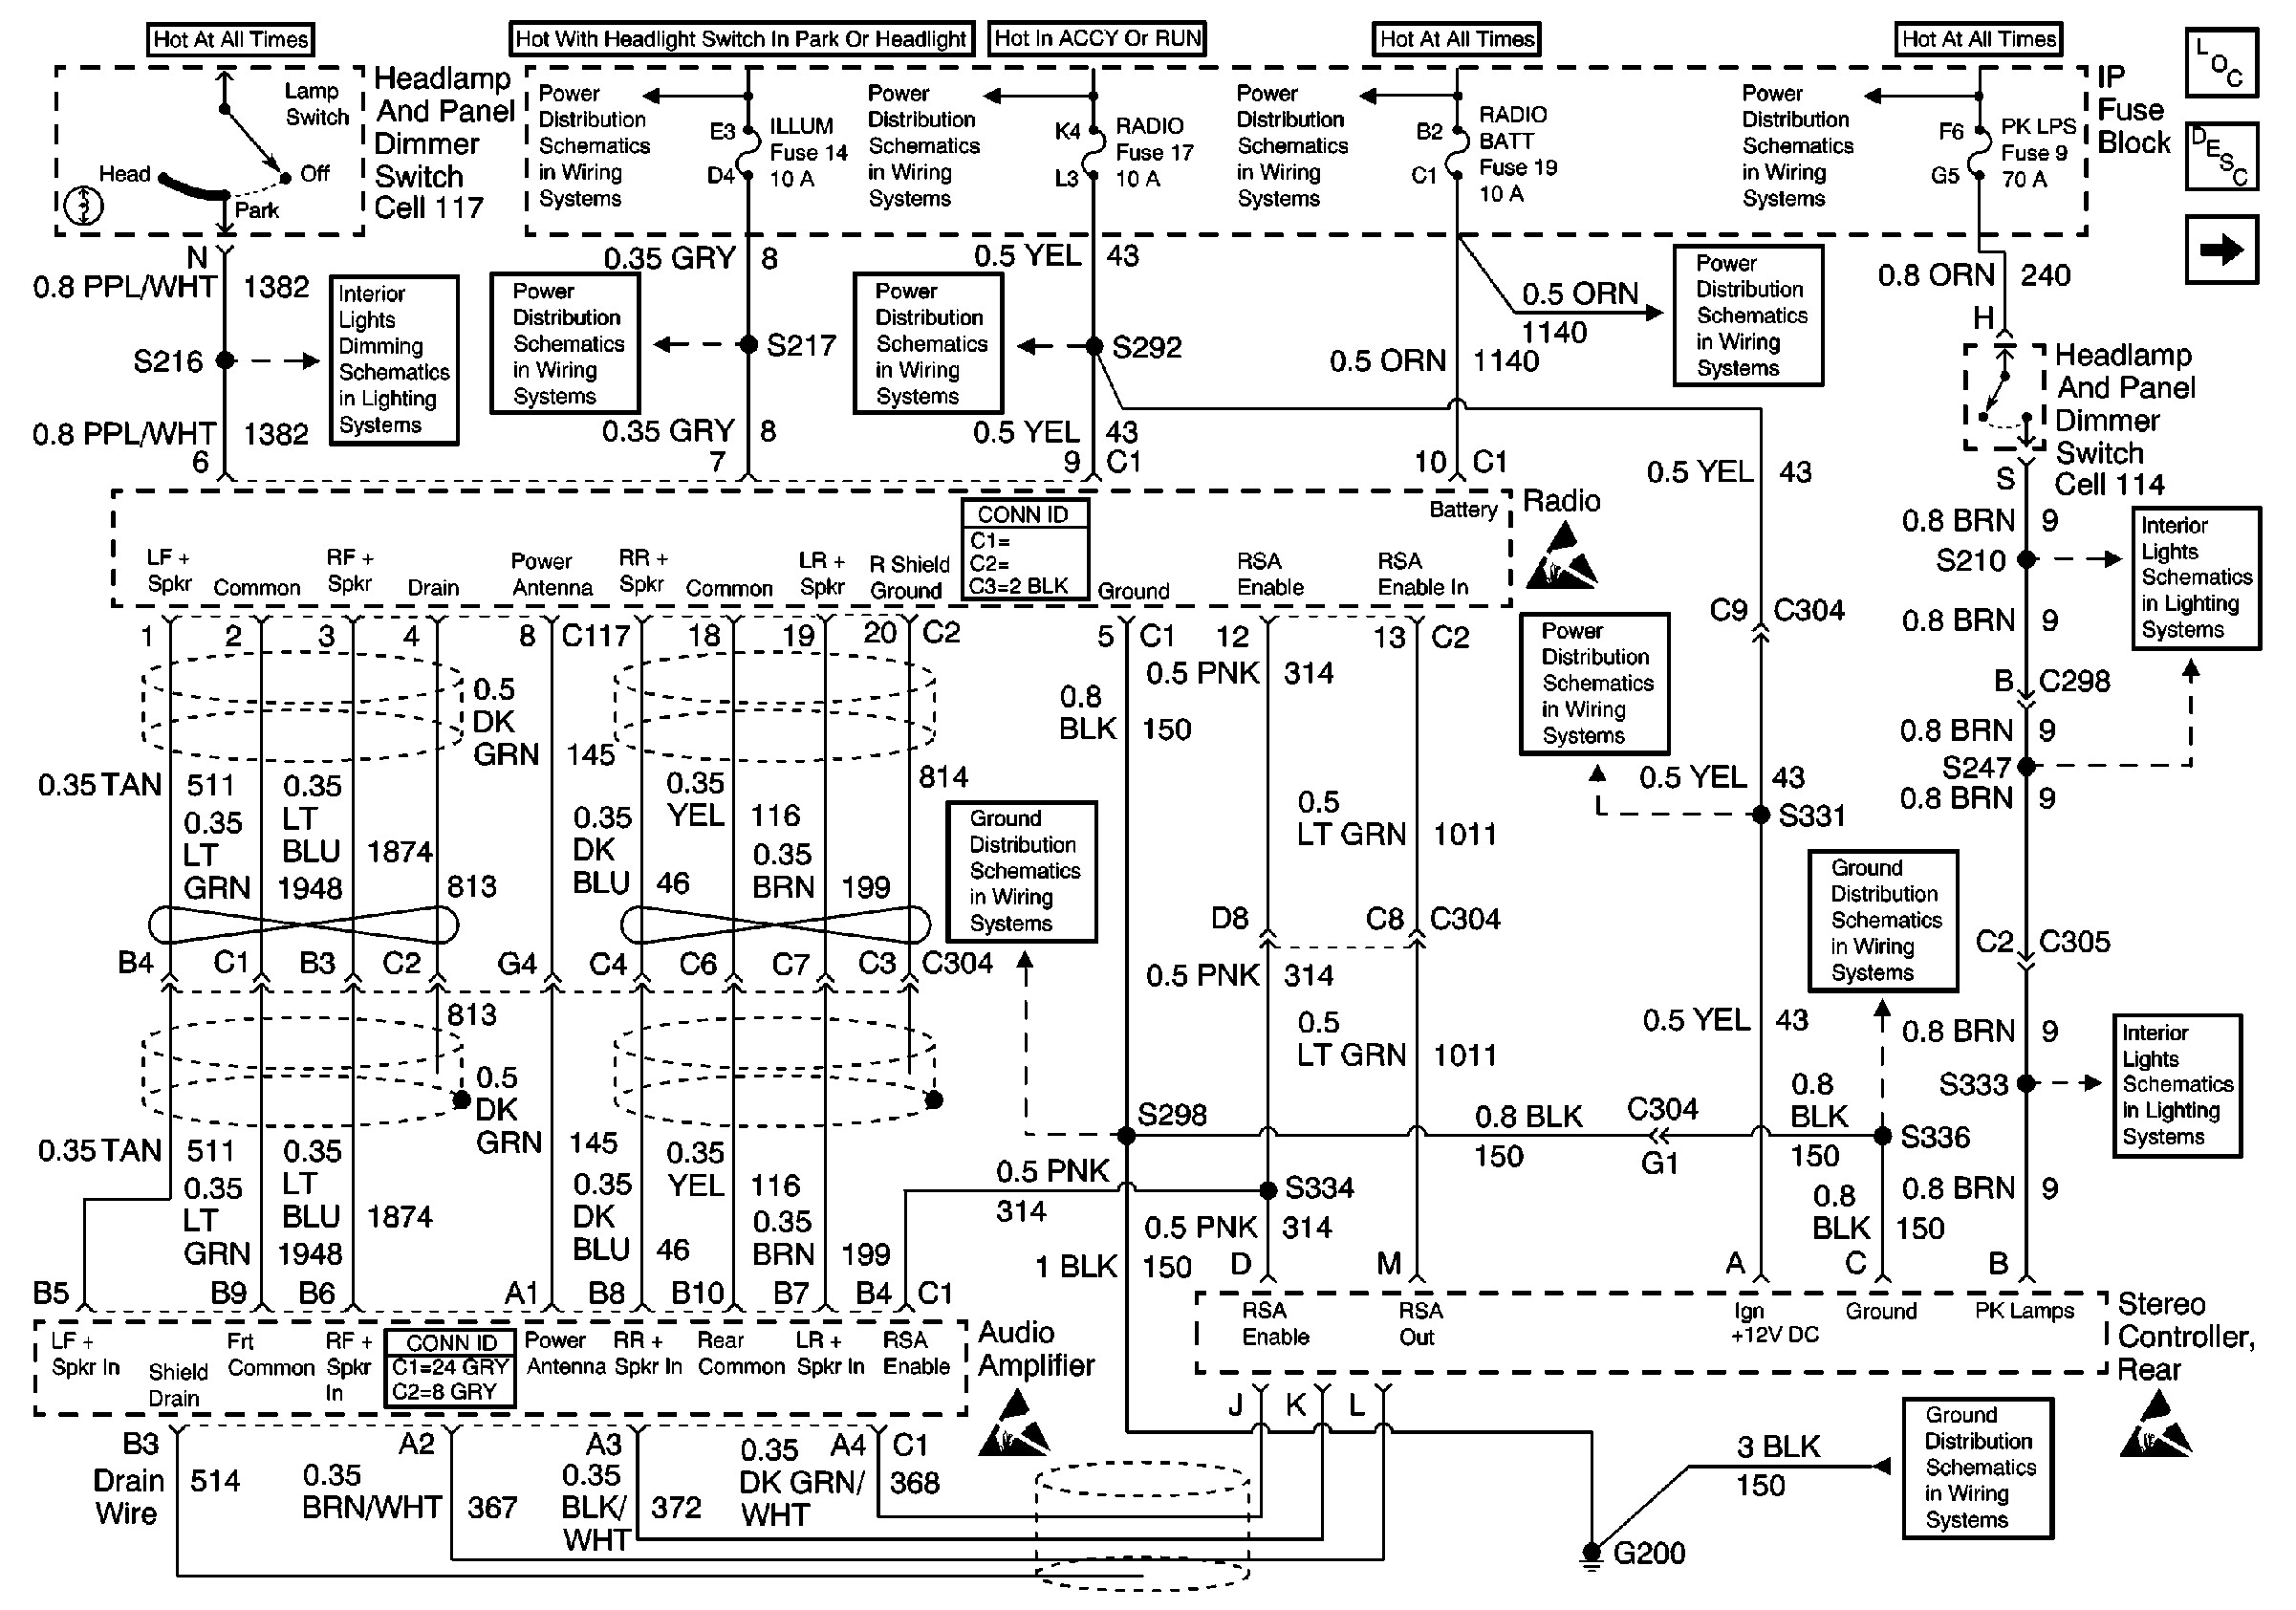 Cadillac Srx Wiring Wiring Diagrams Schema Schema Massimocariello It